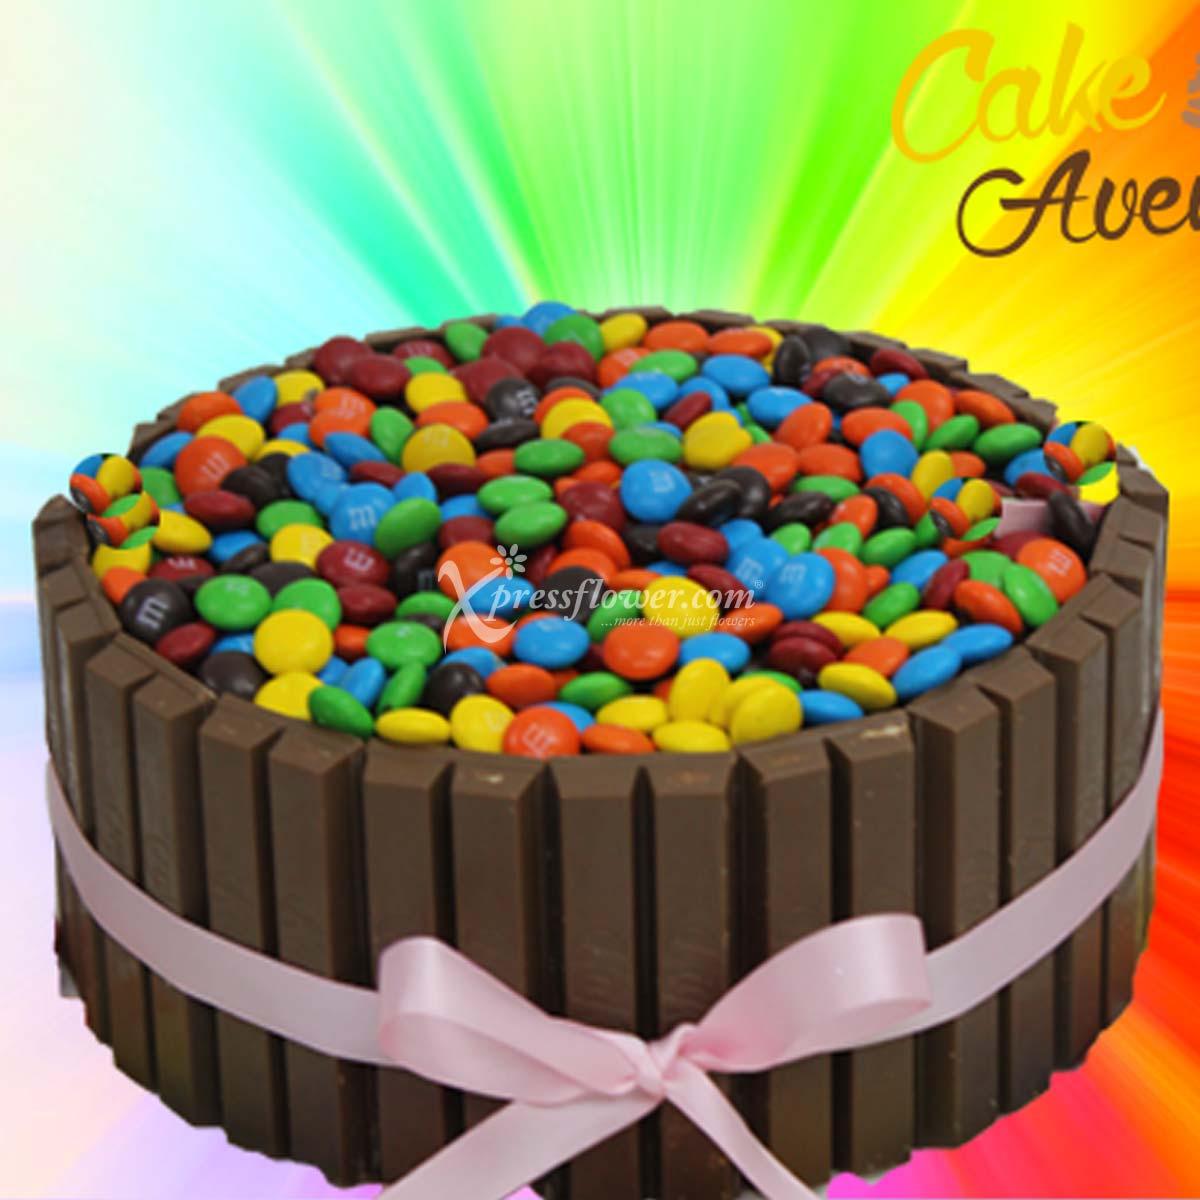 CAC2117 Chocolate Overdose B